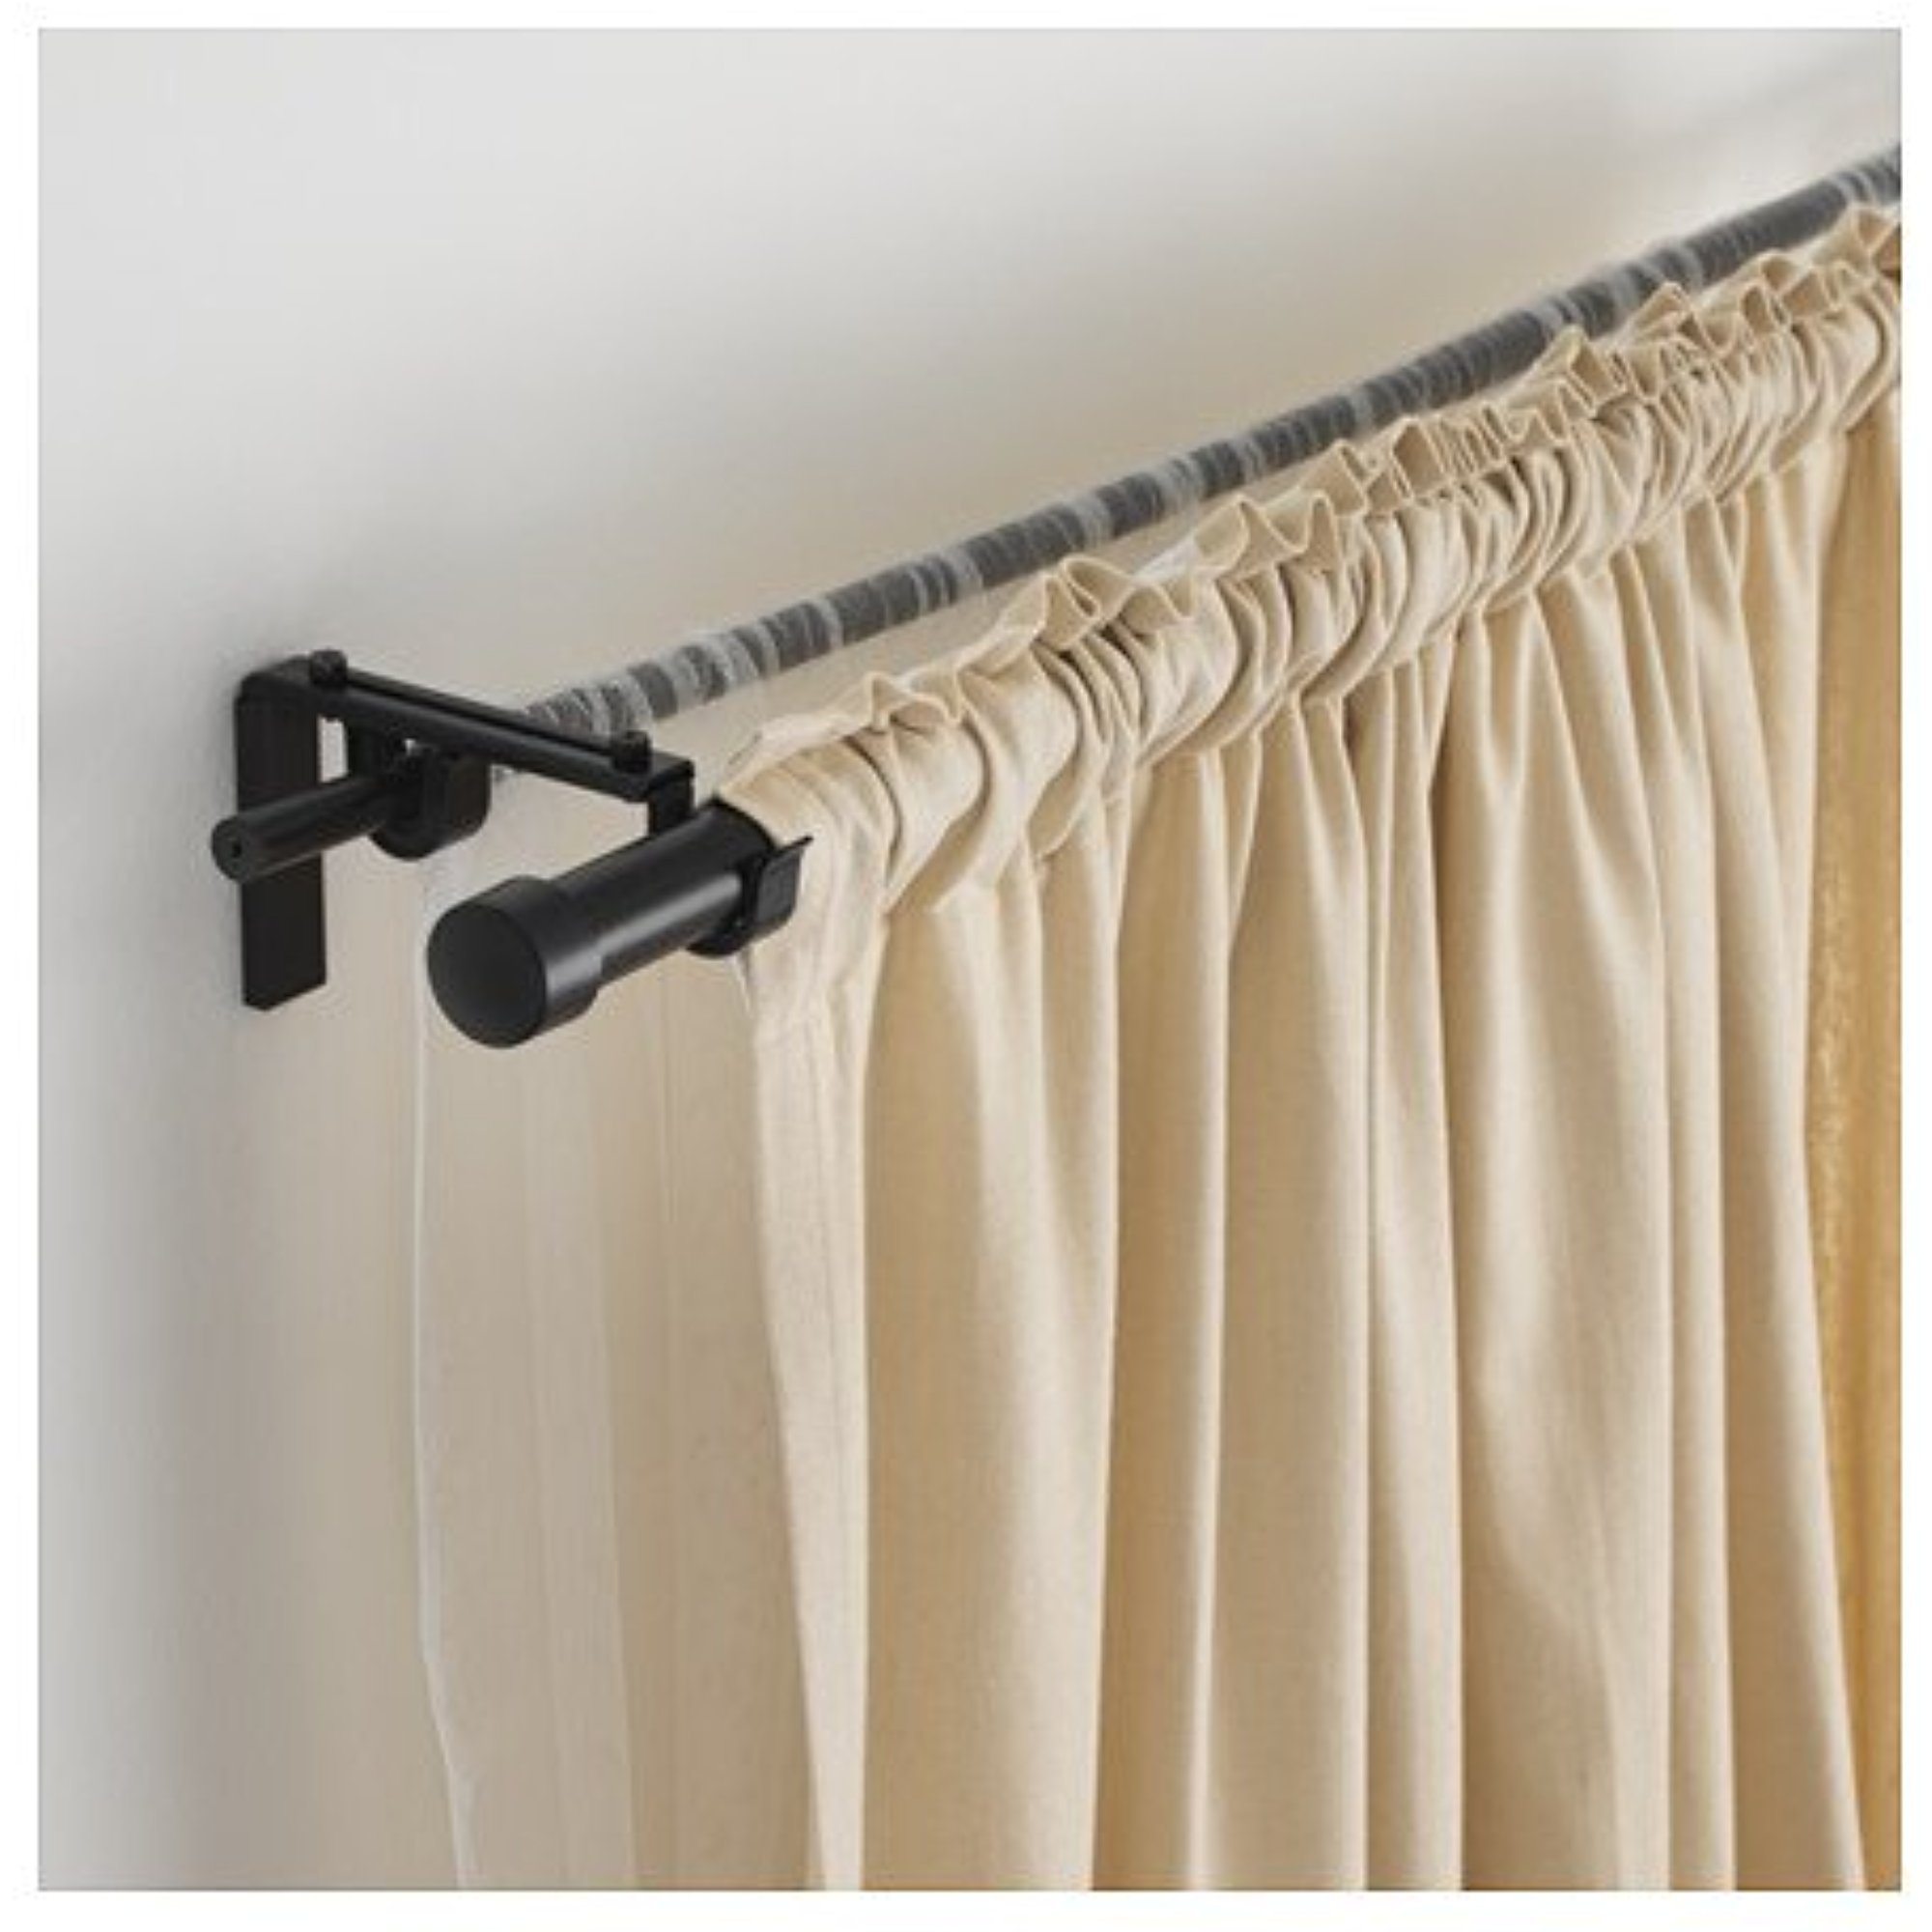 ikea double curtain rod combination black 142020 8298 1830